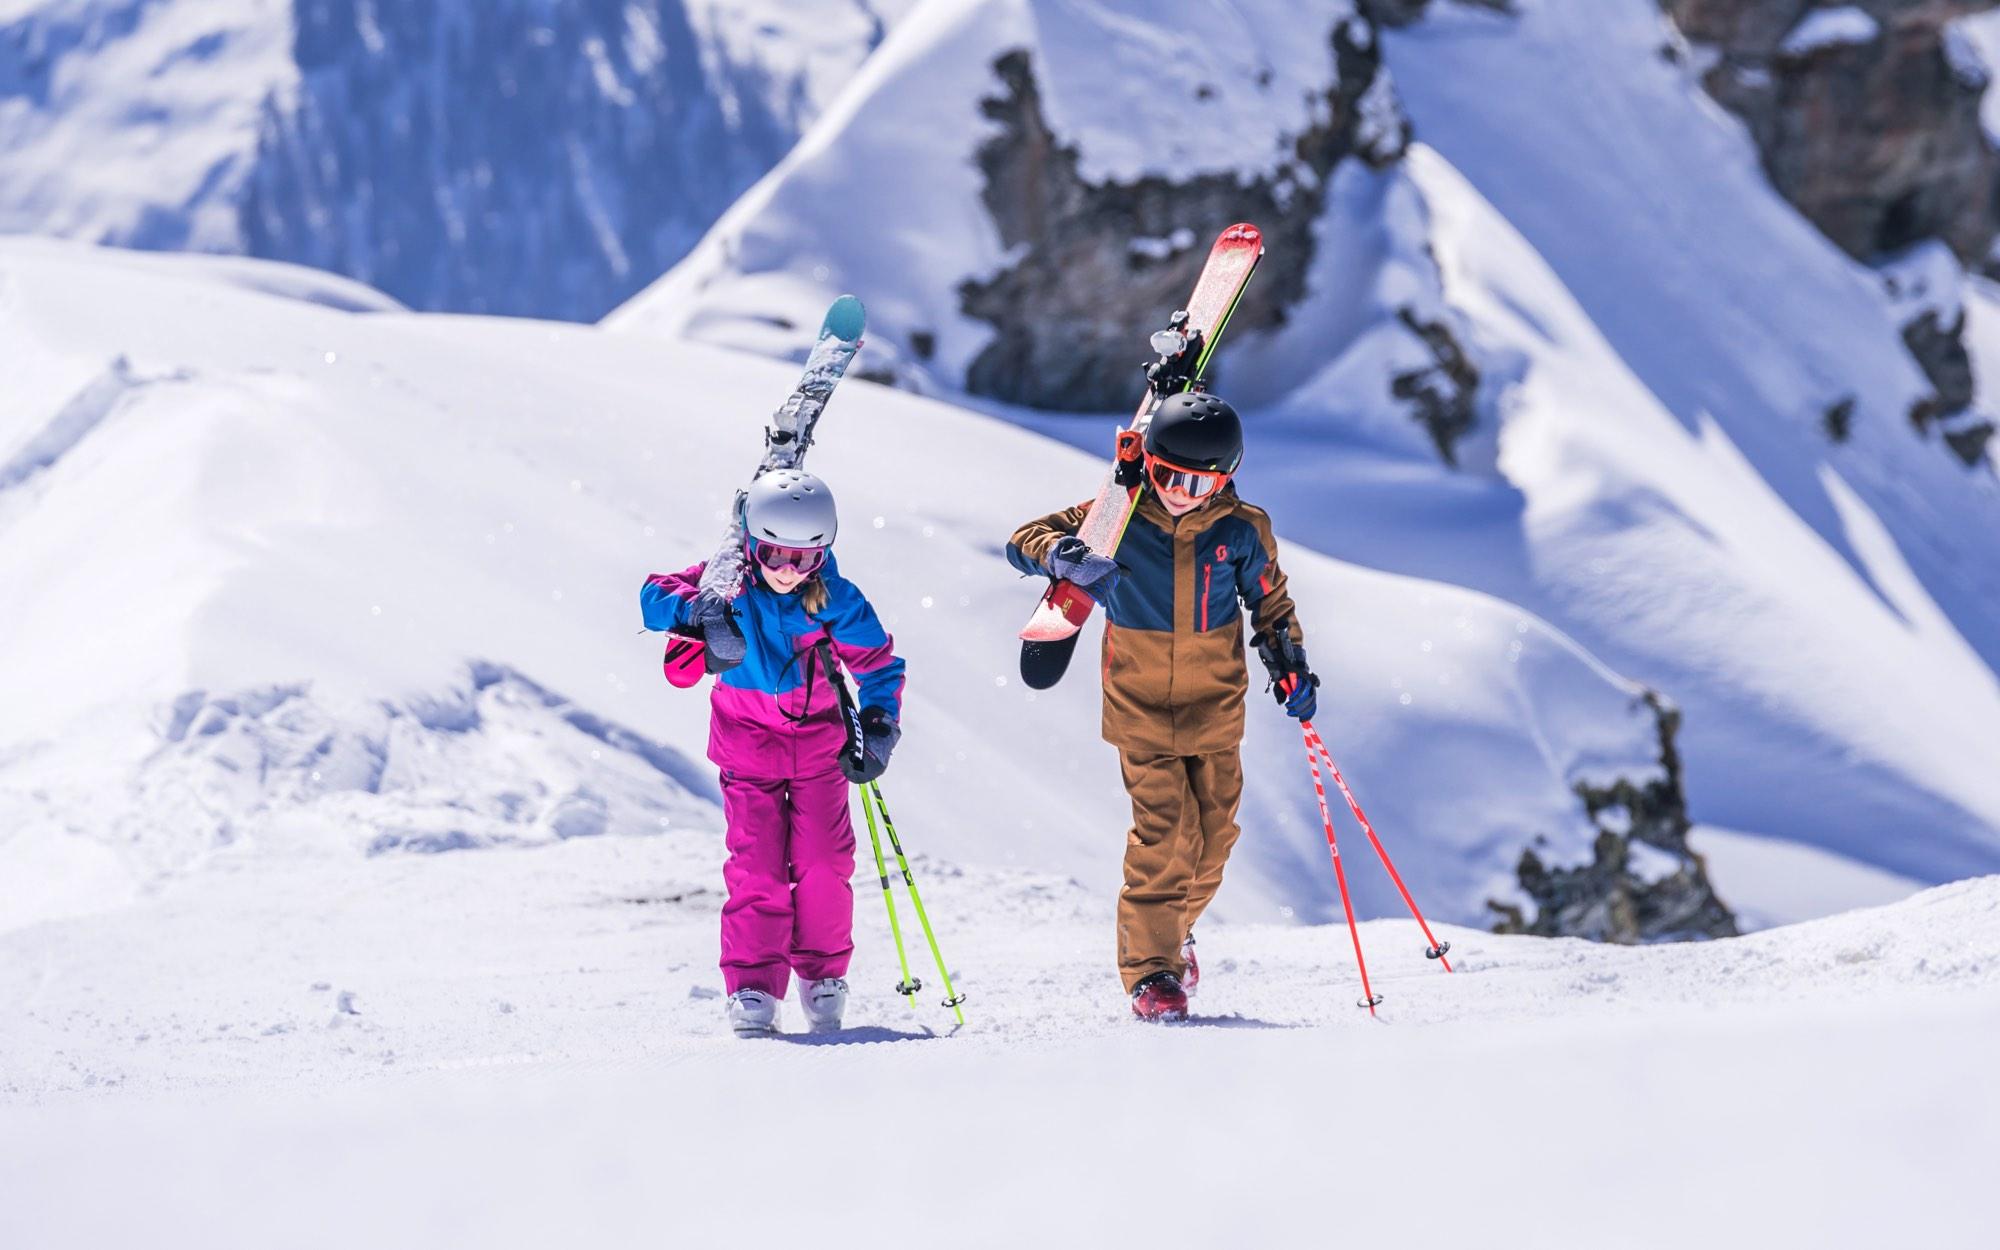 skiing together, avoiding rocks